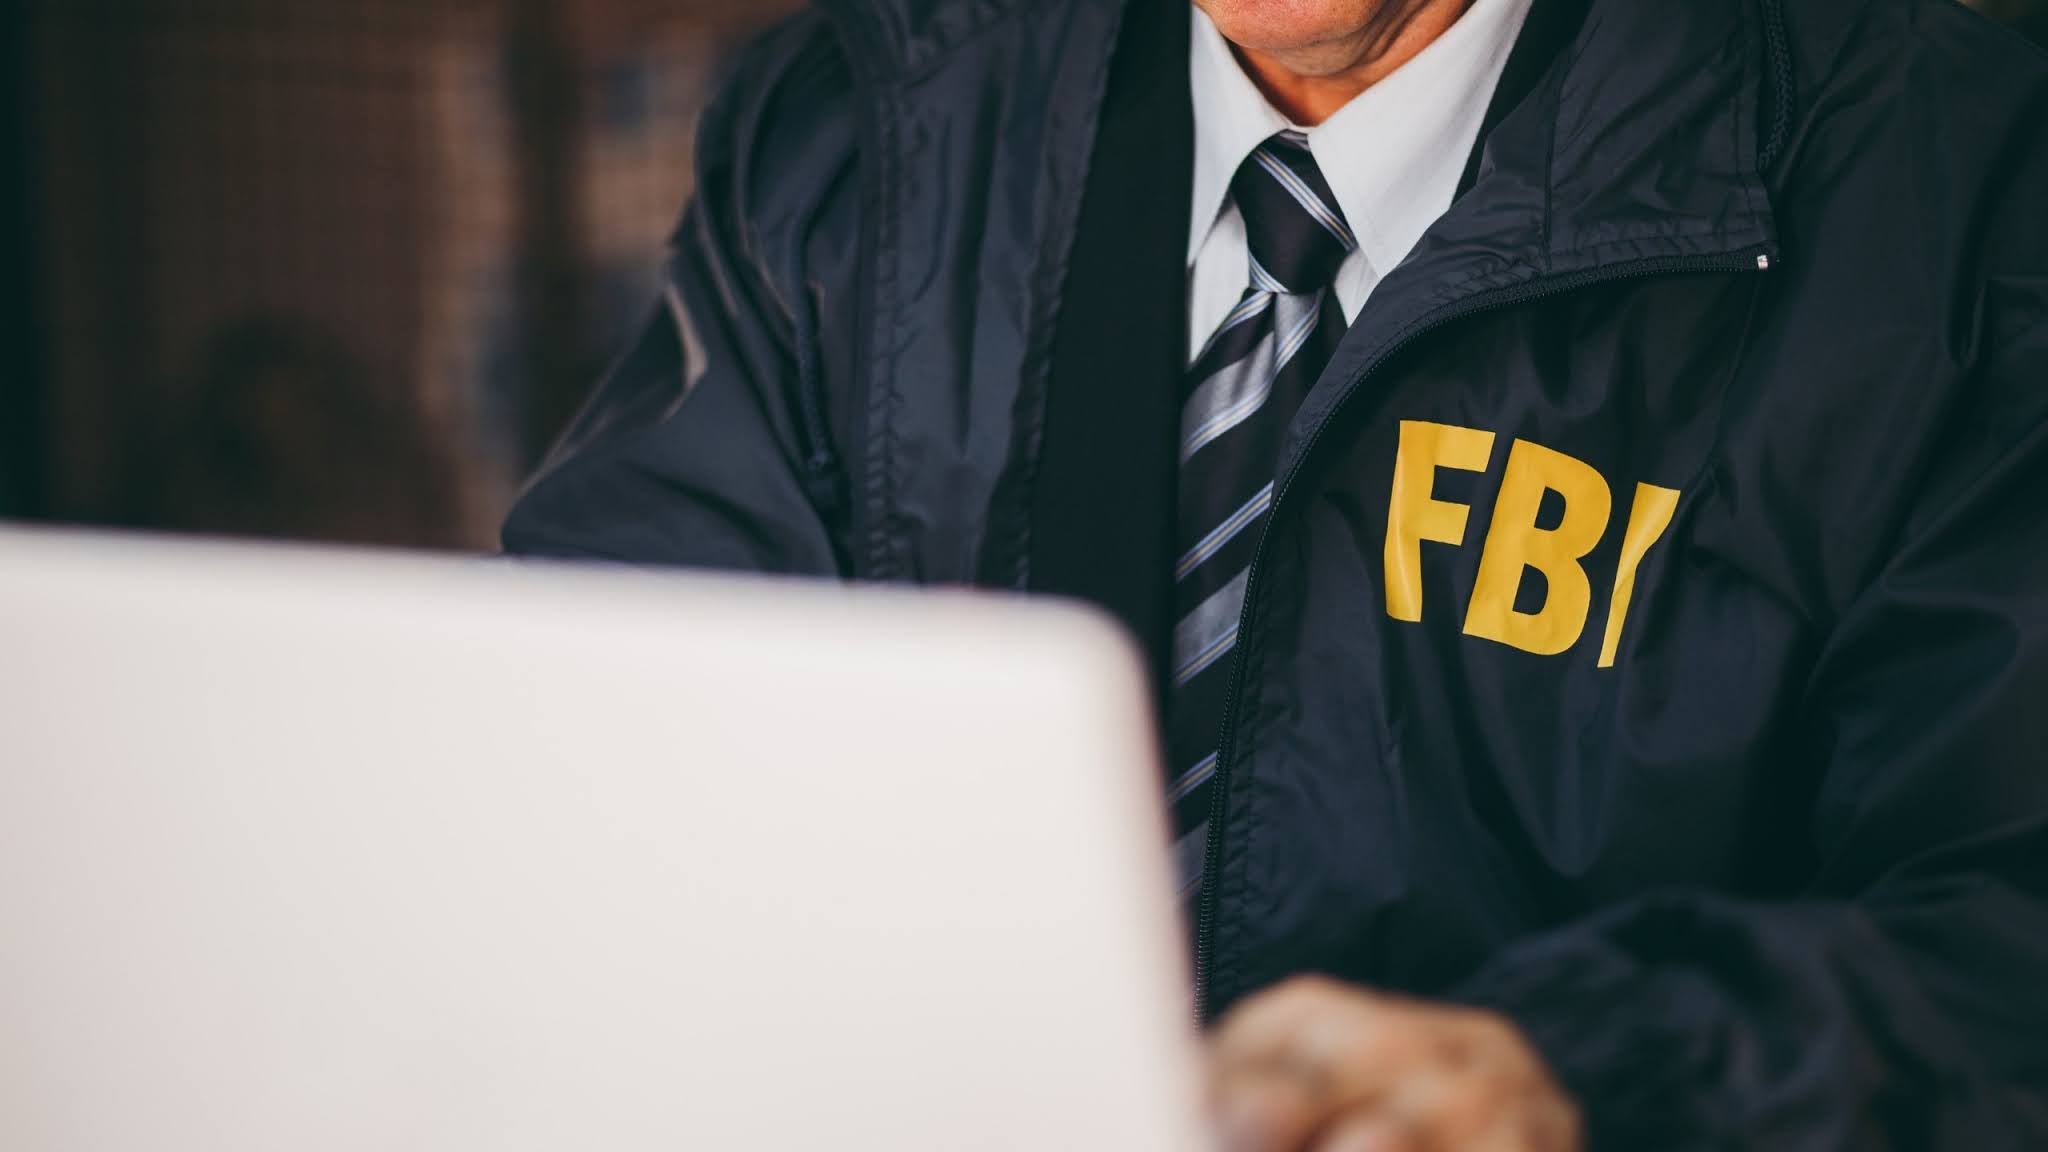 FBI BTC